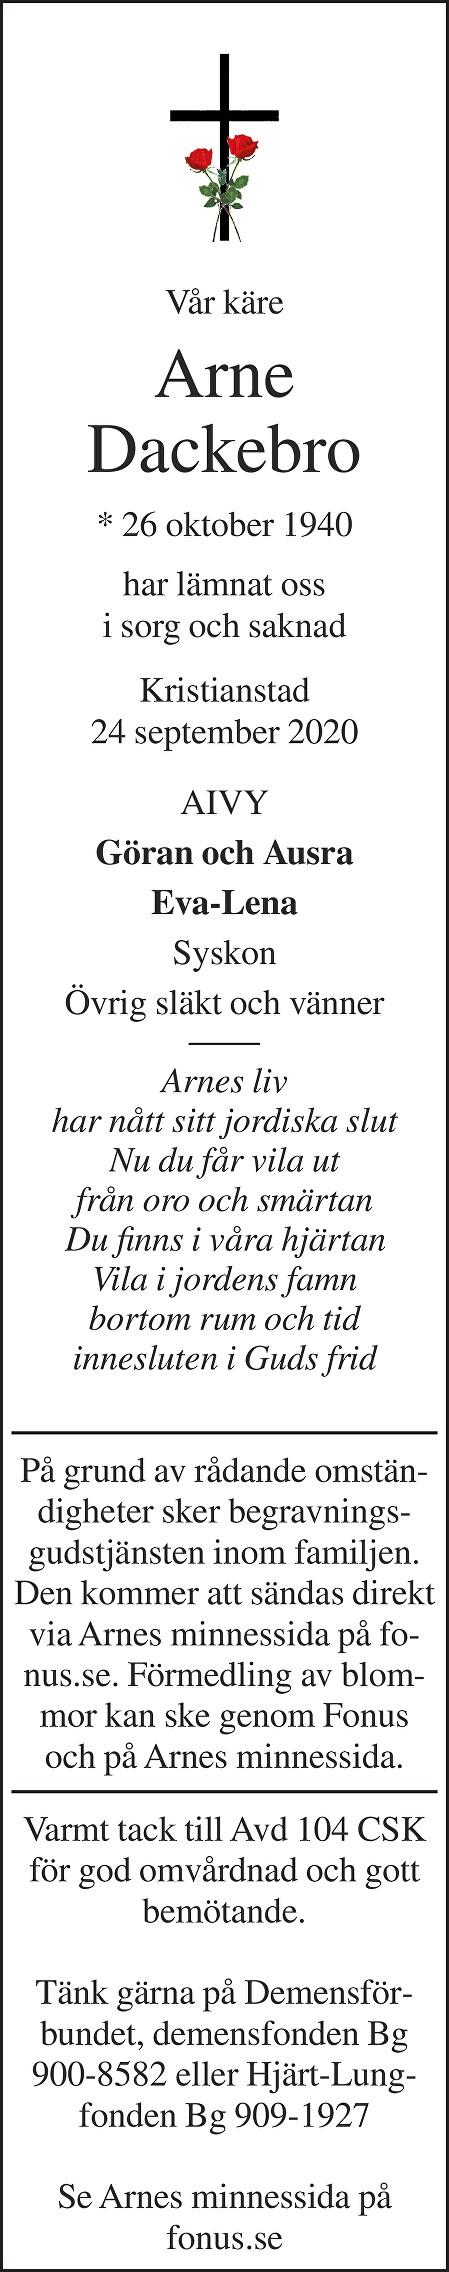 Arne Dackebro Death notice